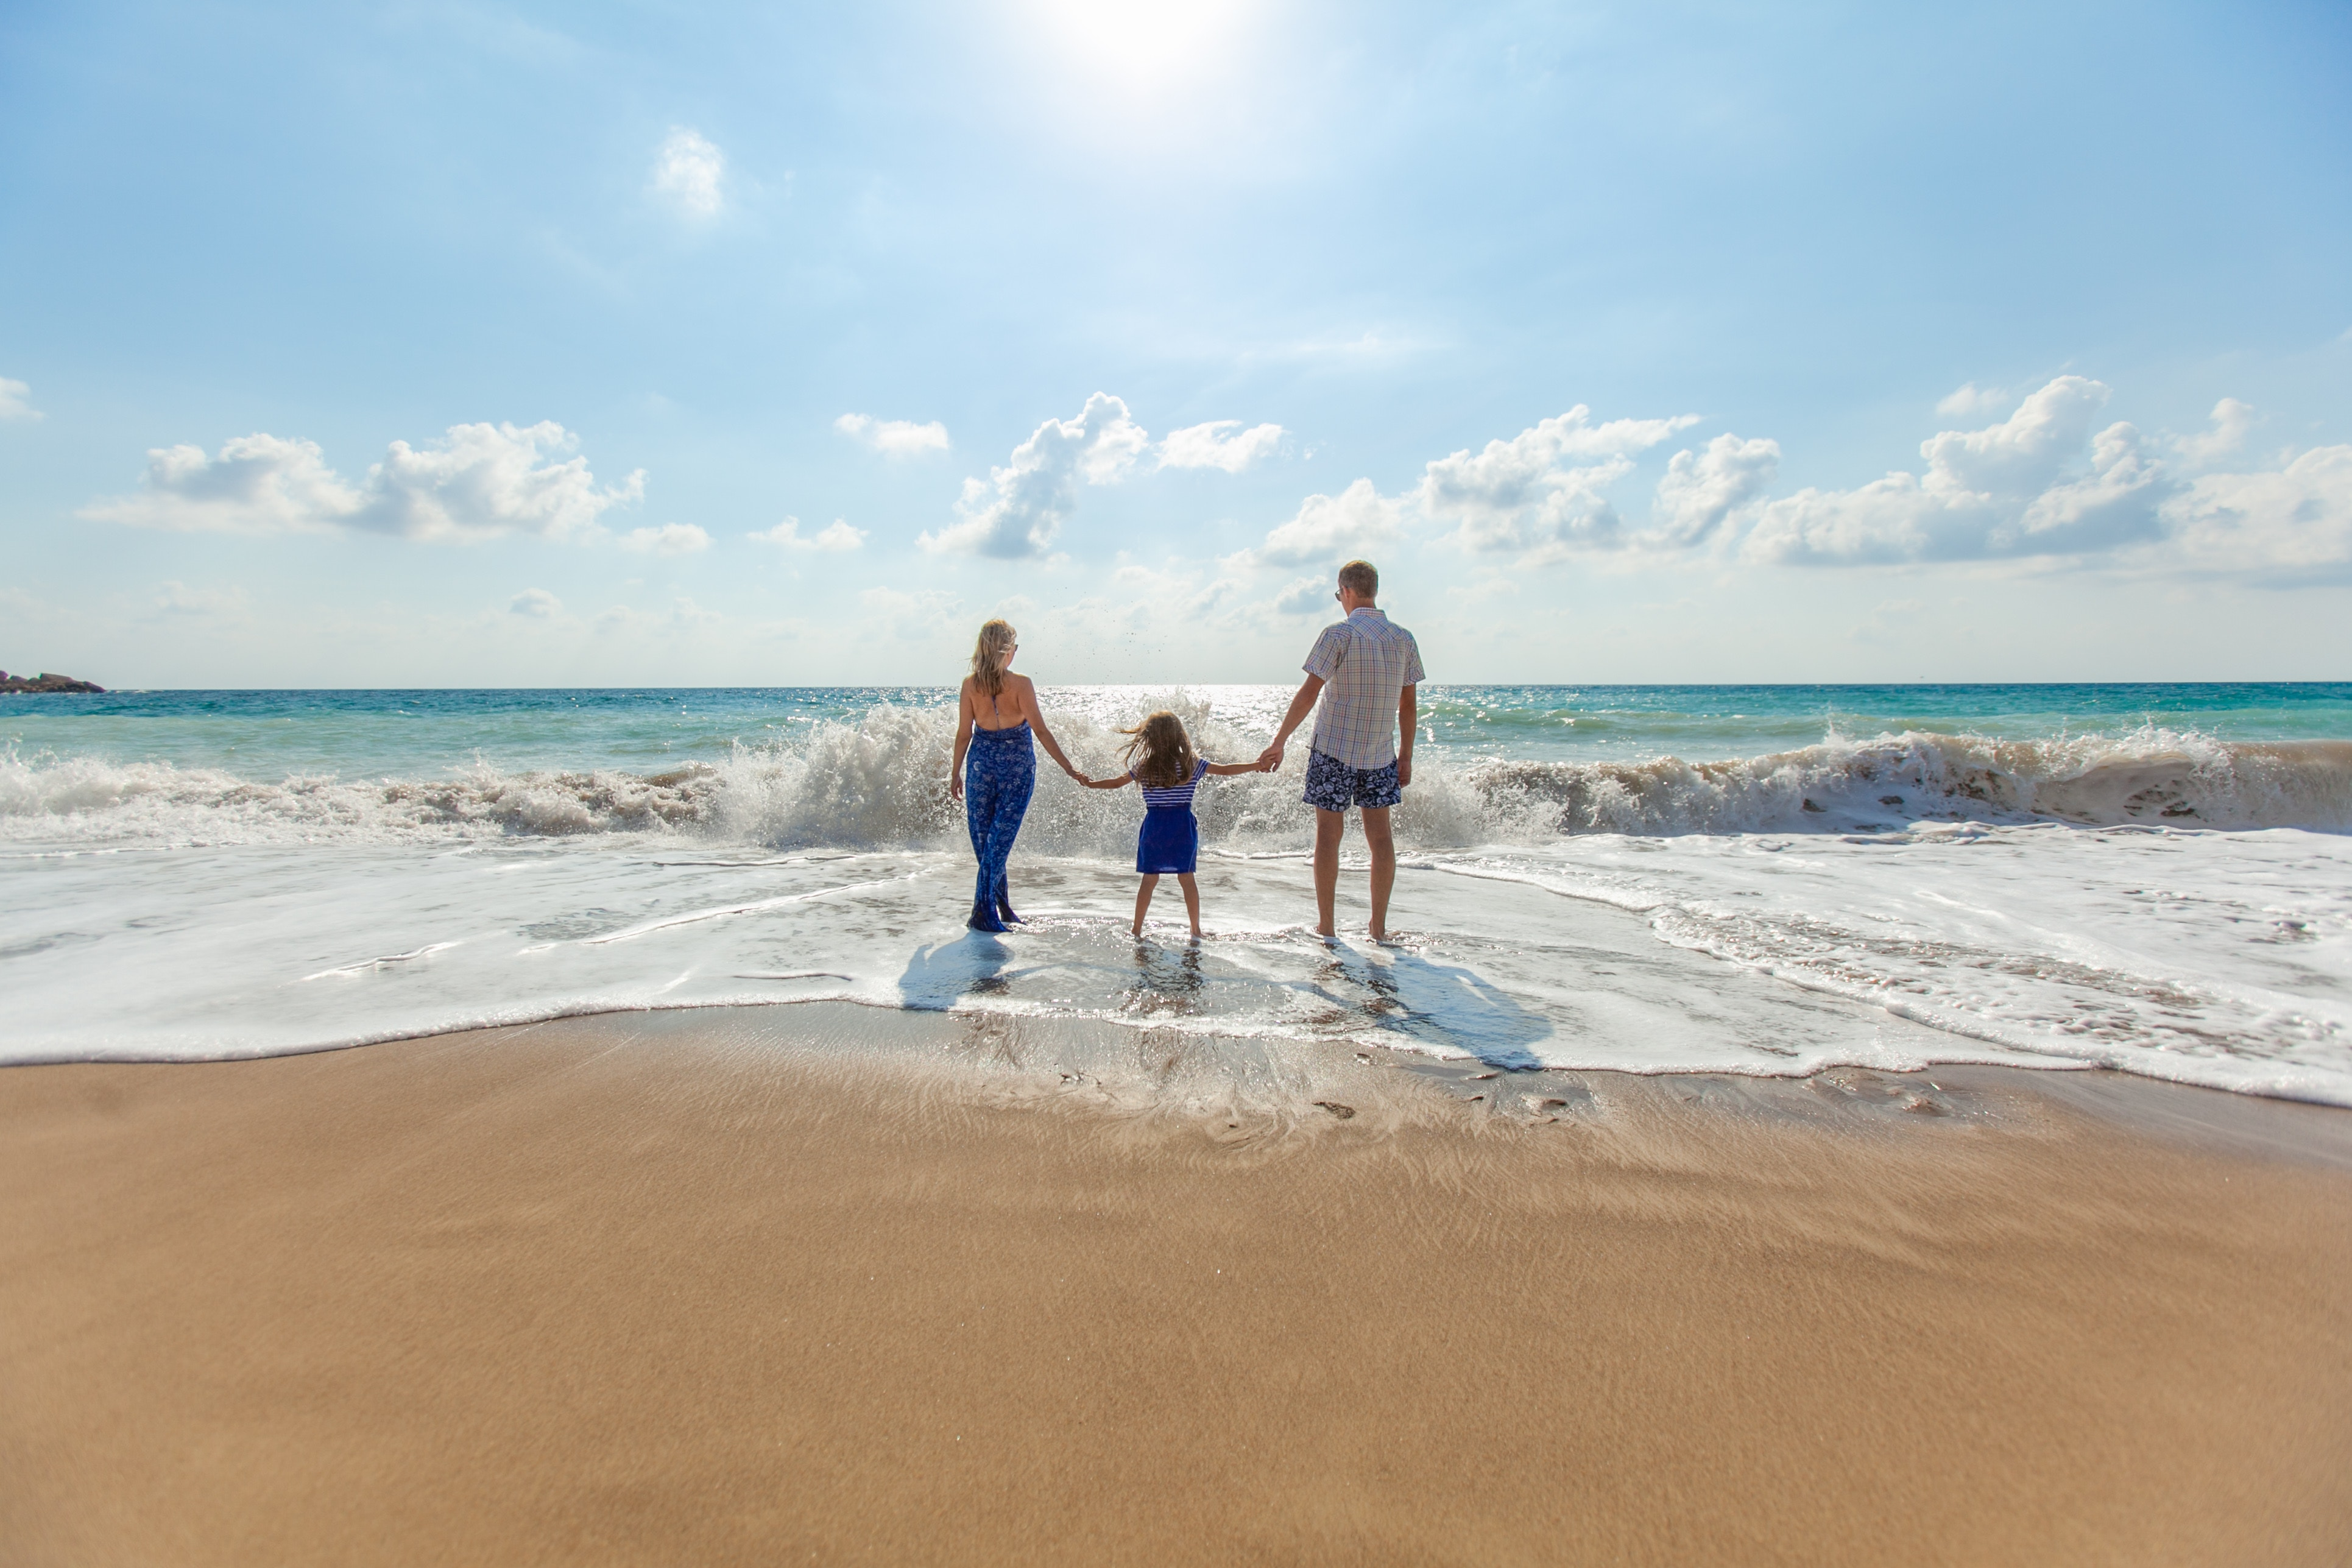 Family of three at the beach